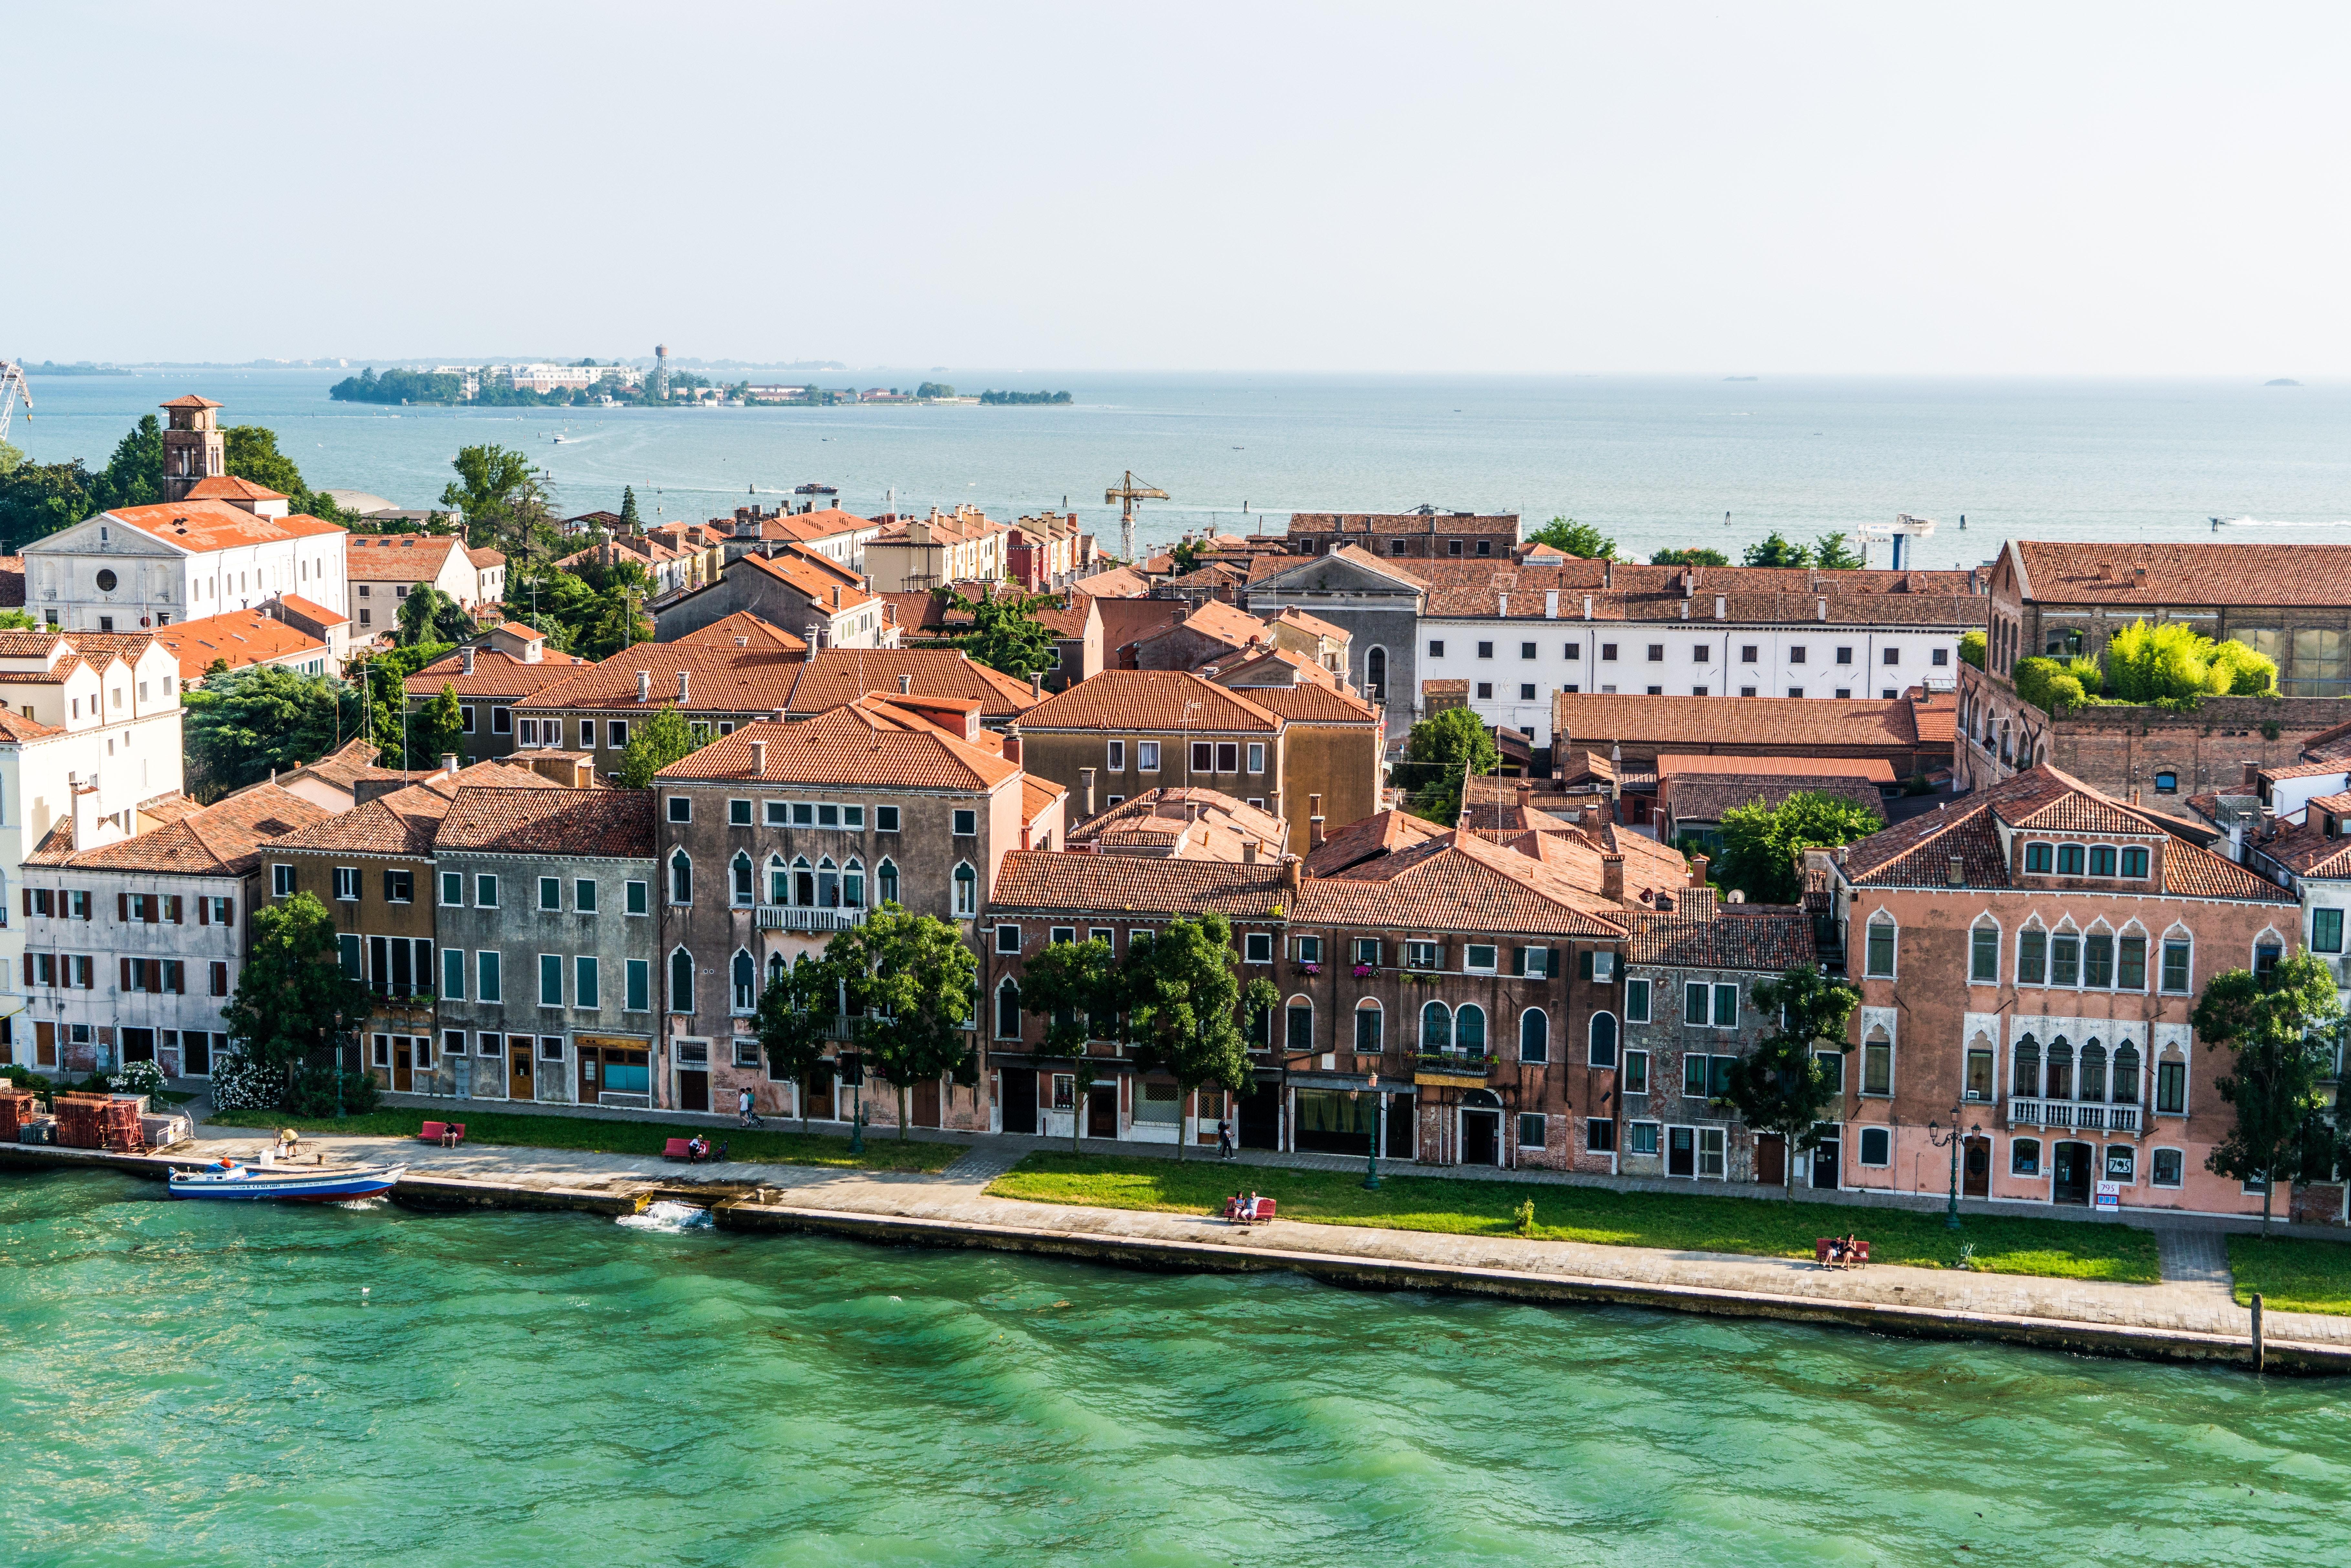 Aerial View of City during Daytime, Architecture, Romantic, Venice, Venezia, HQ Photo